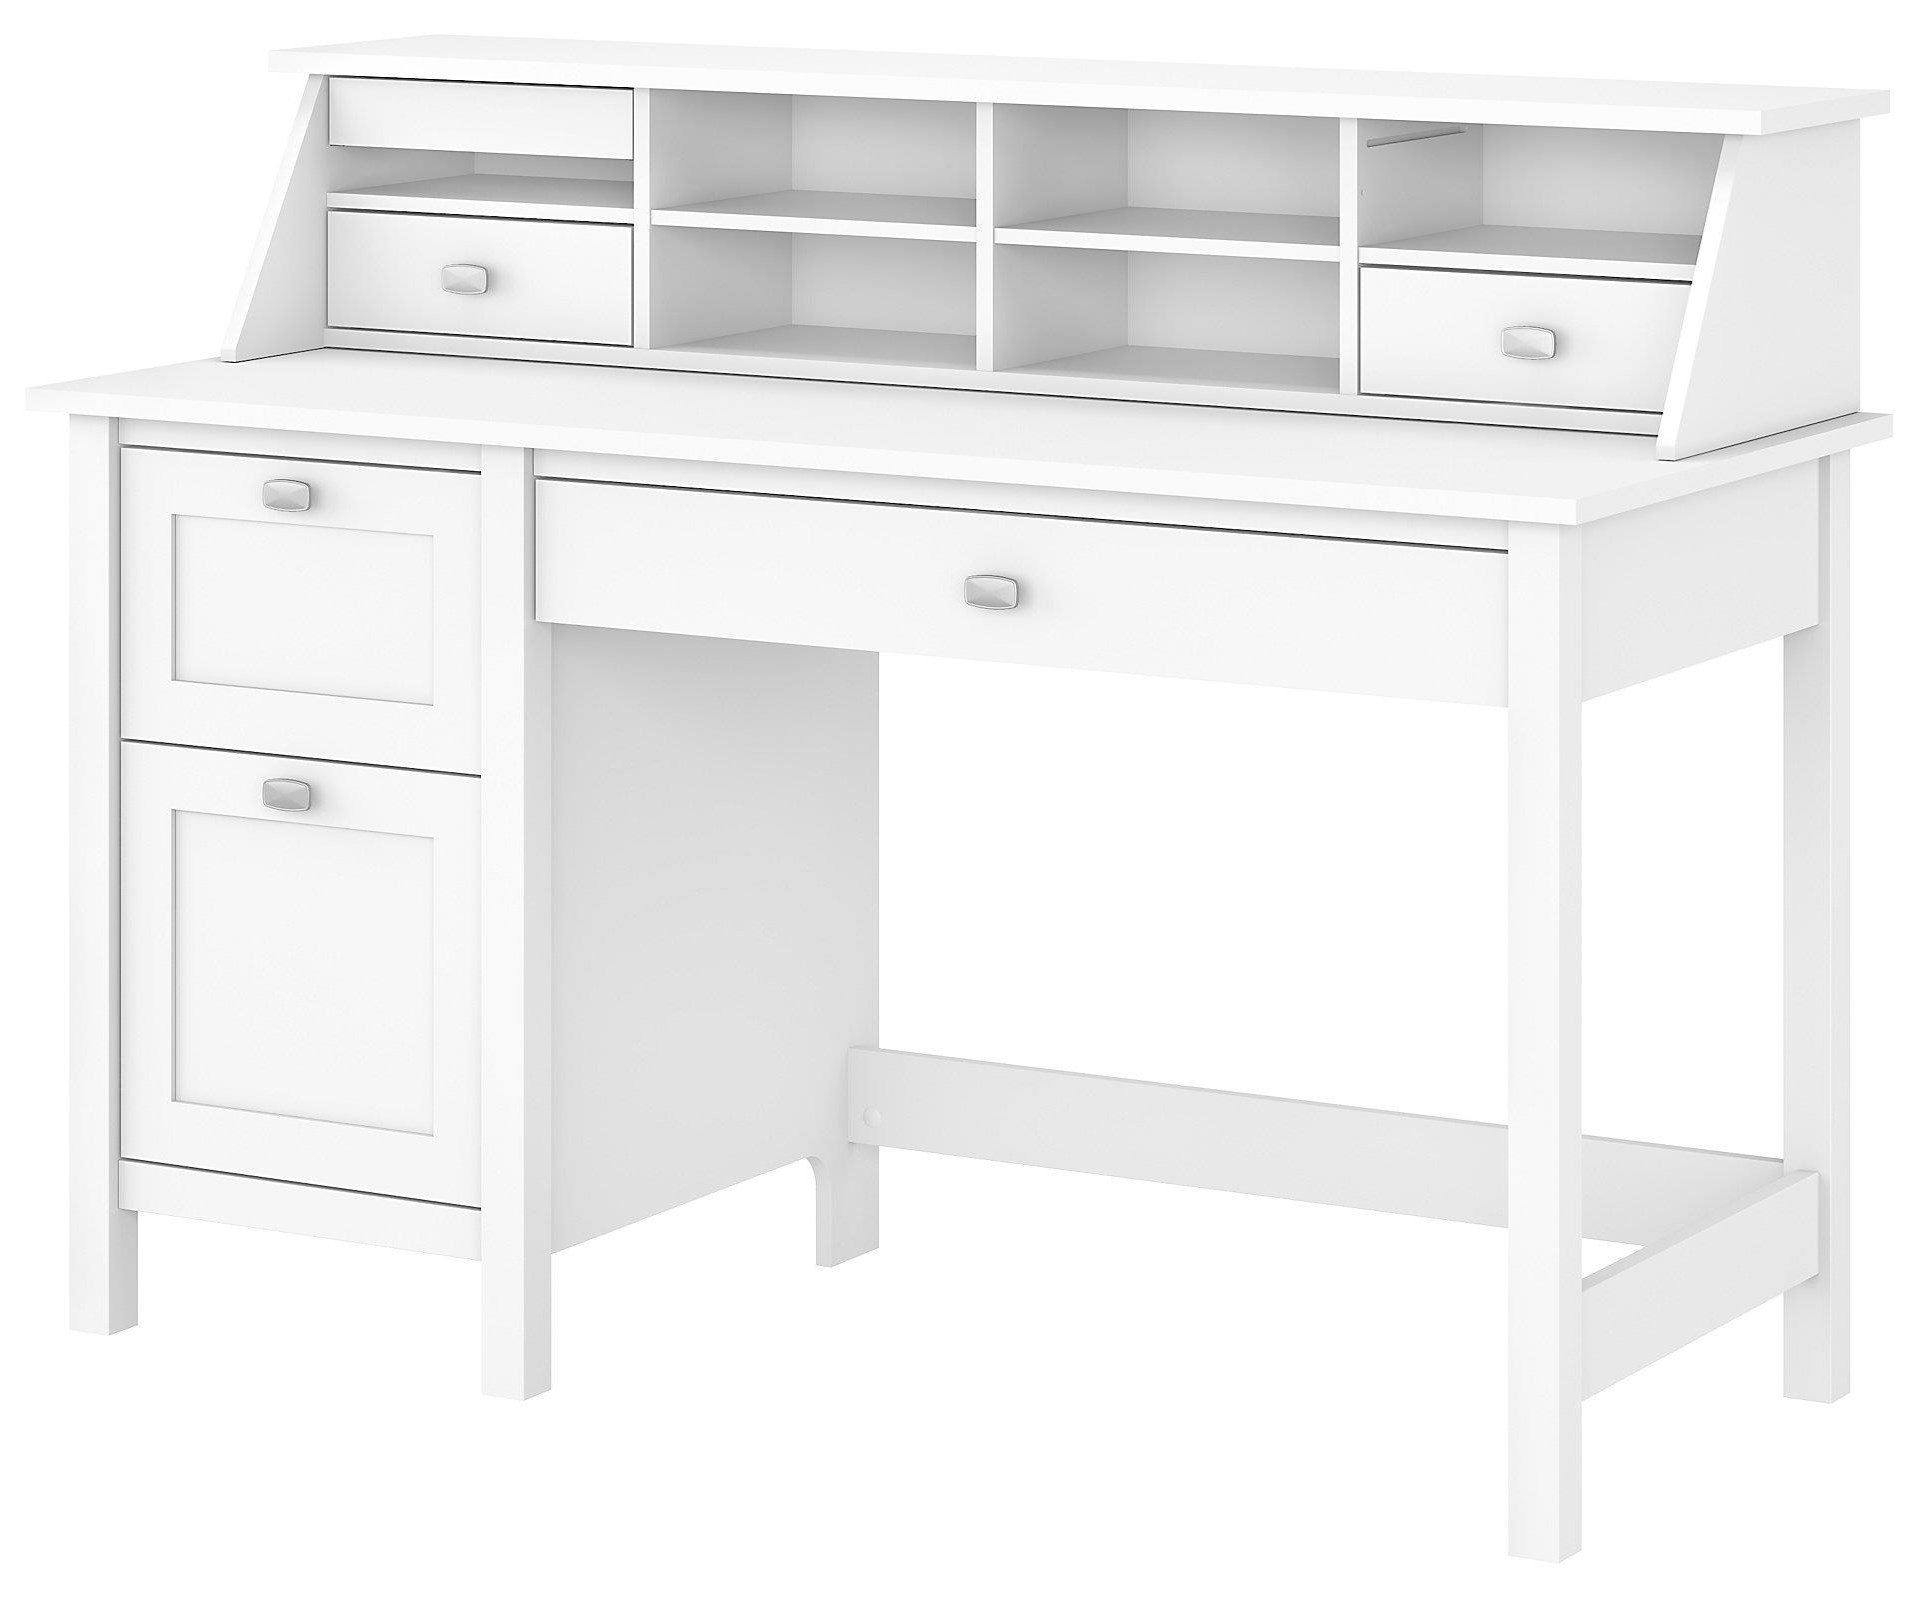 Picture of: Bush Broadview Computer Desk With 2 Drawer Pedestal And Organizer Value City Furniture Single Pedestal Desks